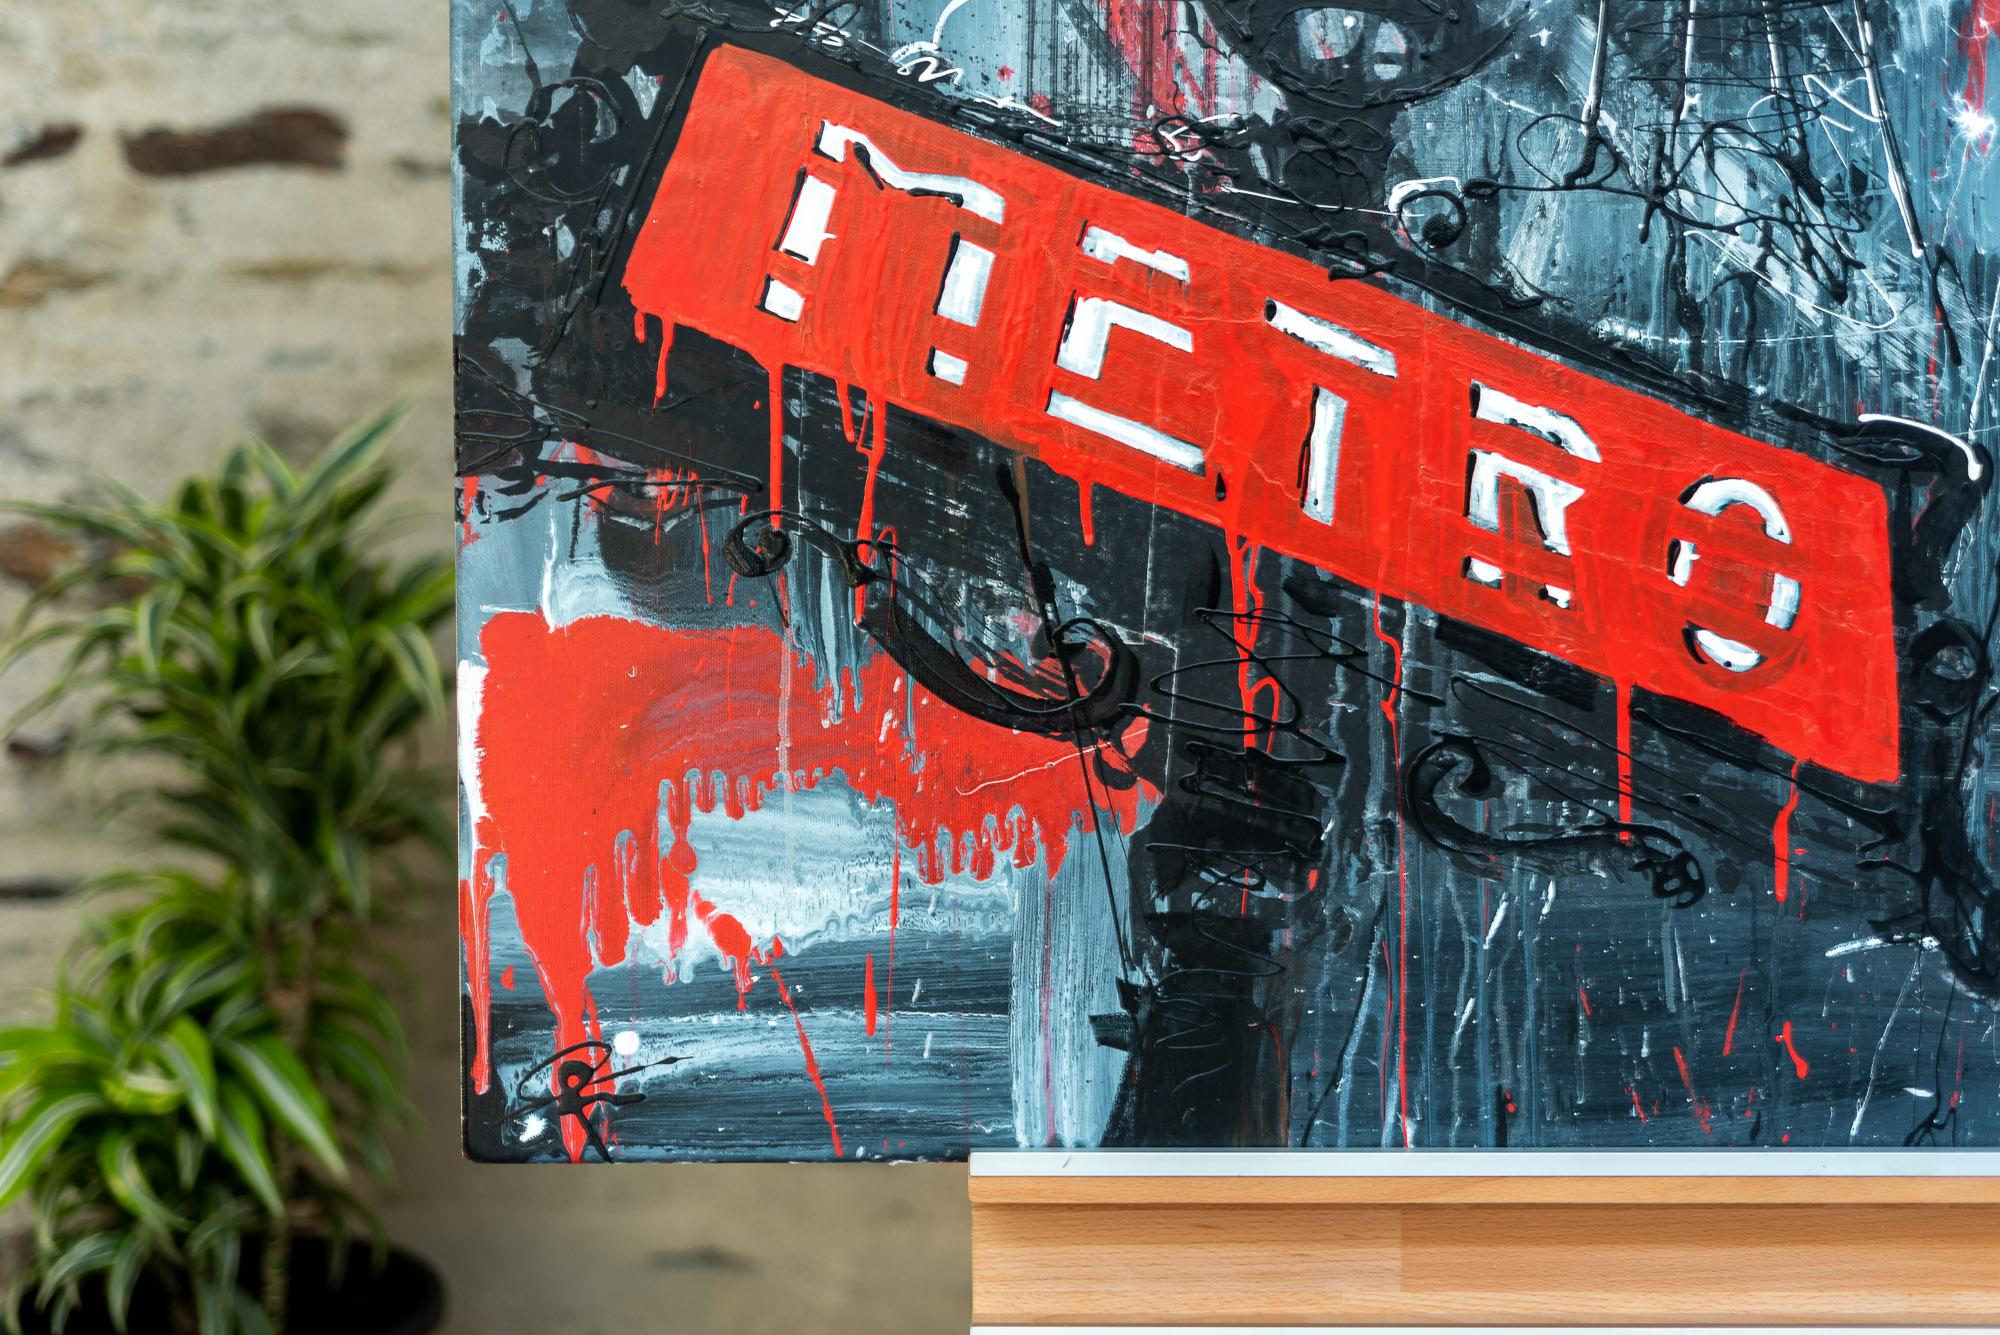 Paris Medley by Paul Kenton, UK contemporary cityscape artist, an original painting from his Paris Collection